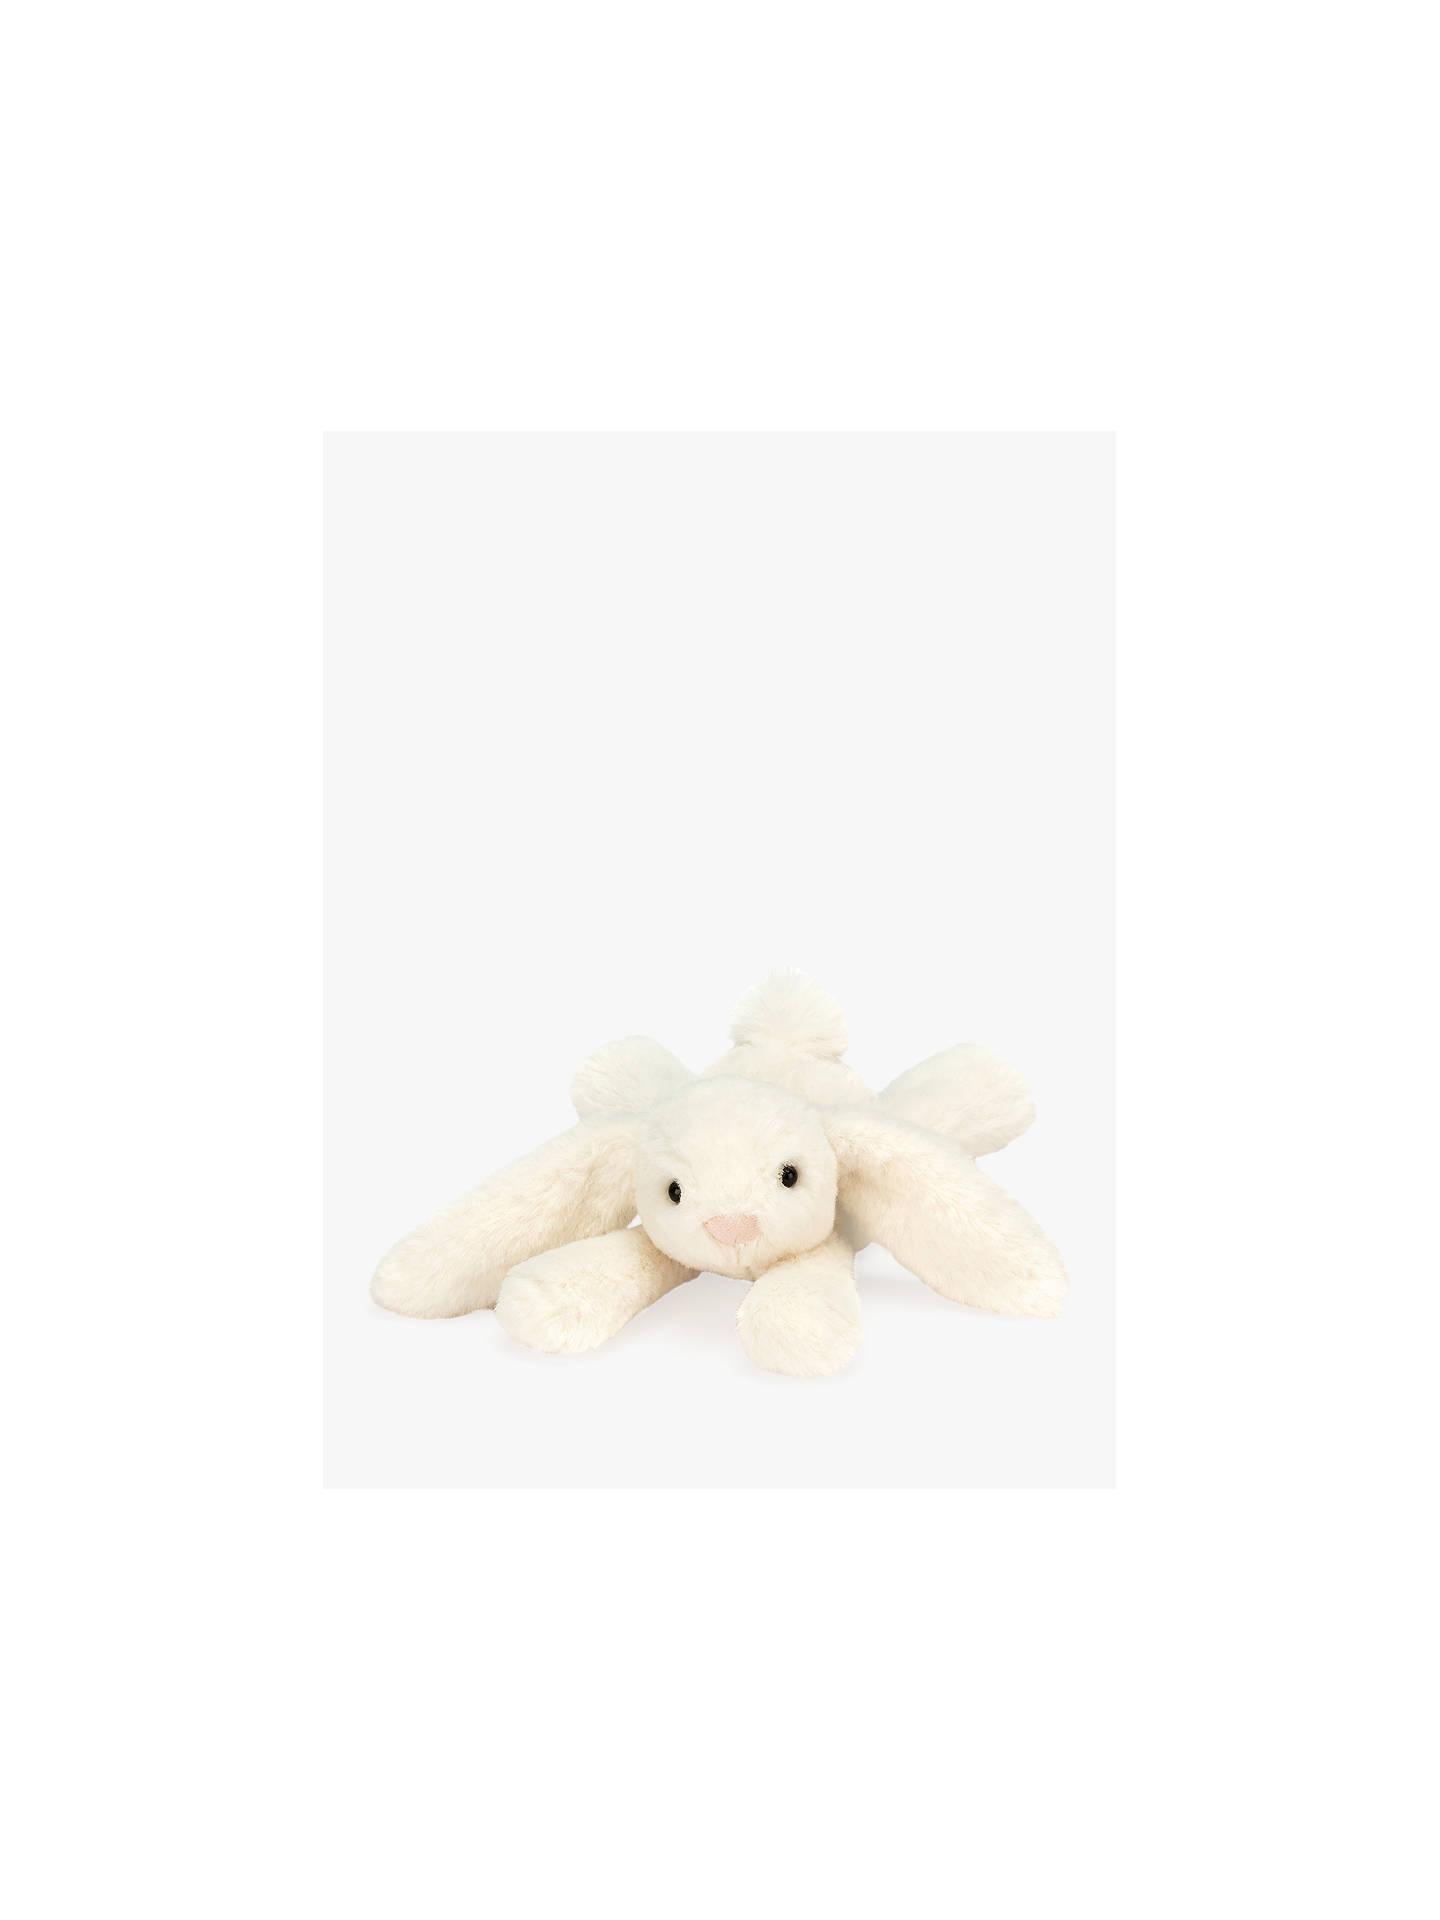 cecbc941110 Buy Jellycat Smudge Bunny Soft Toy